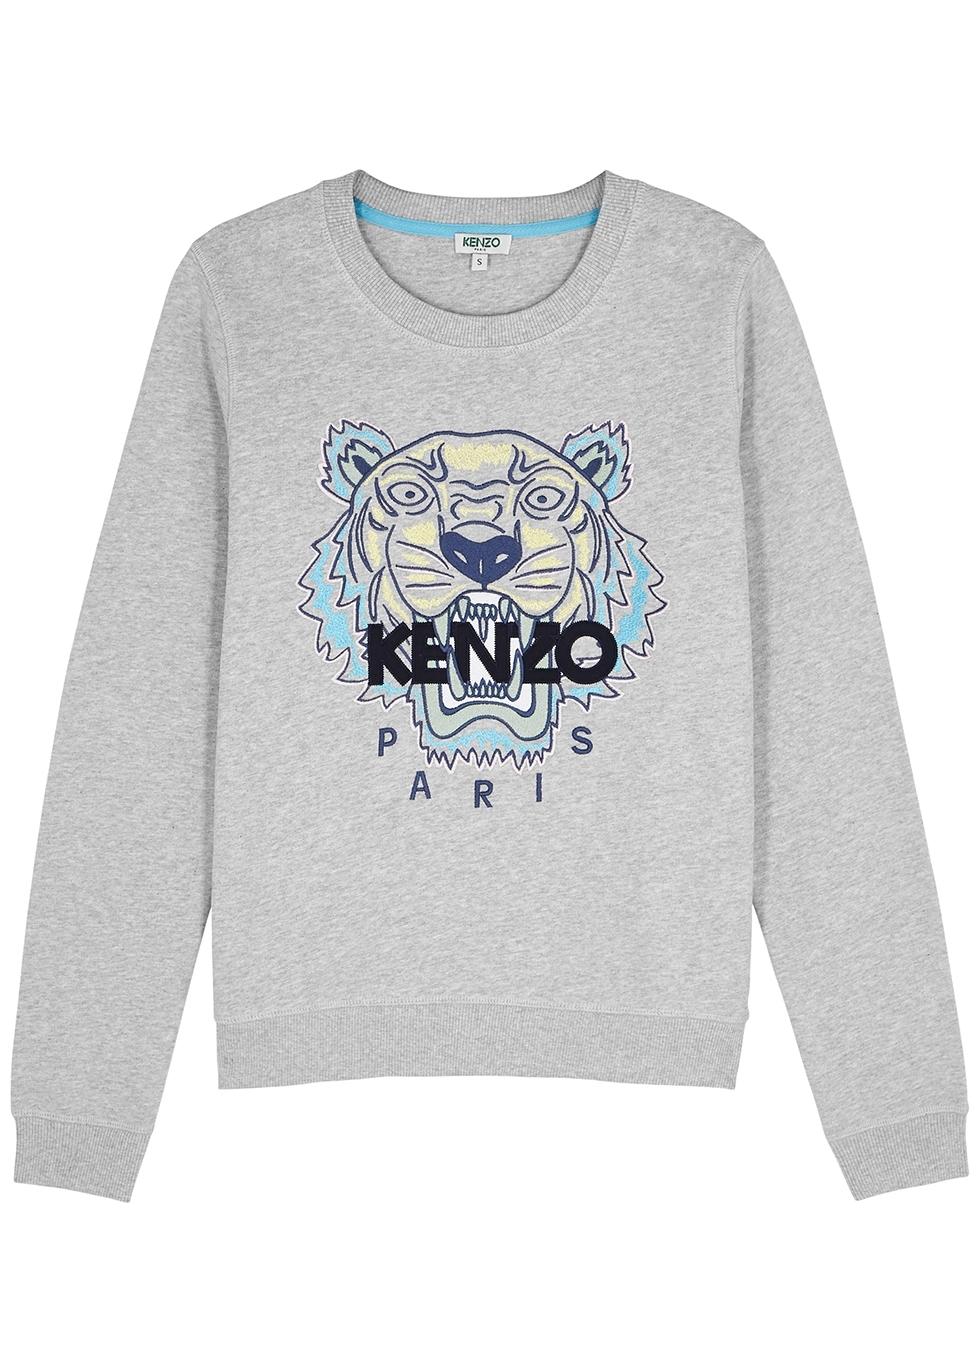 2c0175d3 Kenzo - Designer Sweatshirts, T-Shirts, Bags - Harvey Nichols